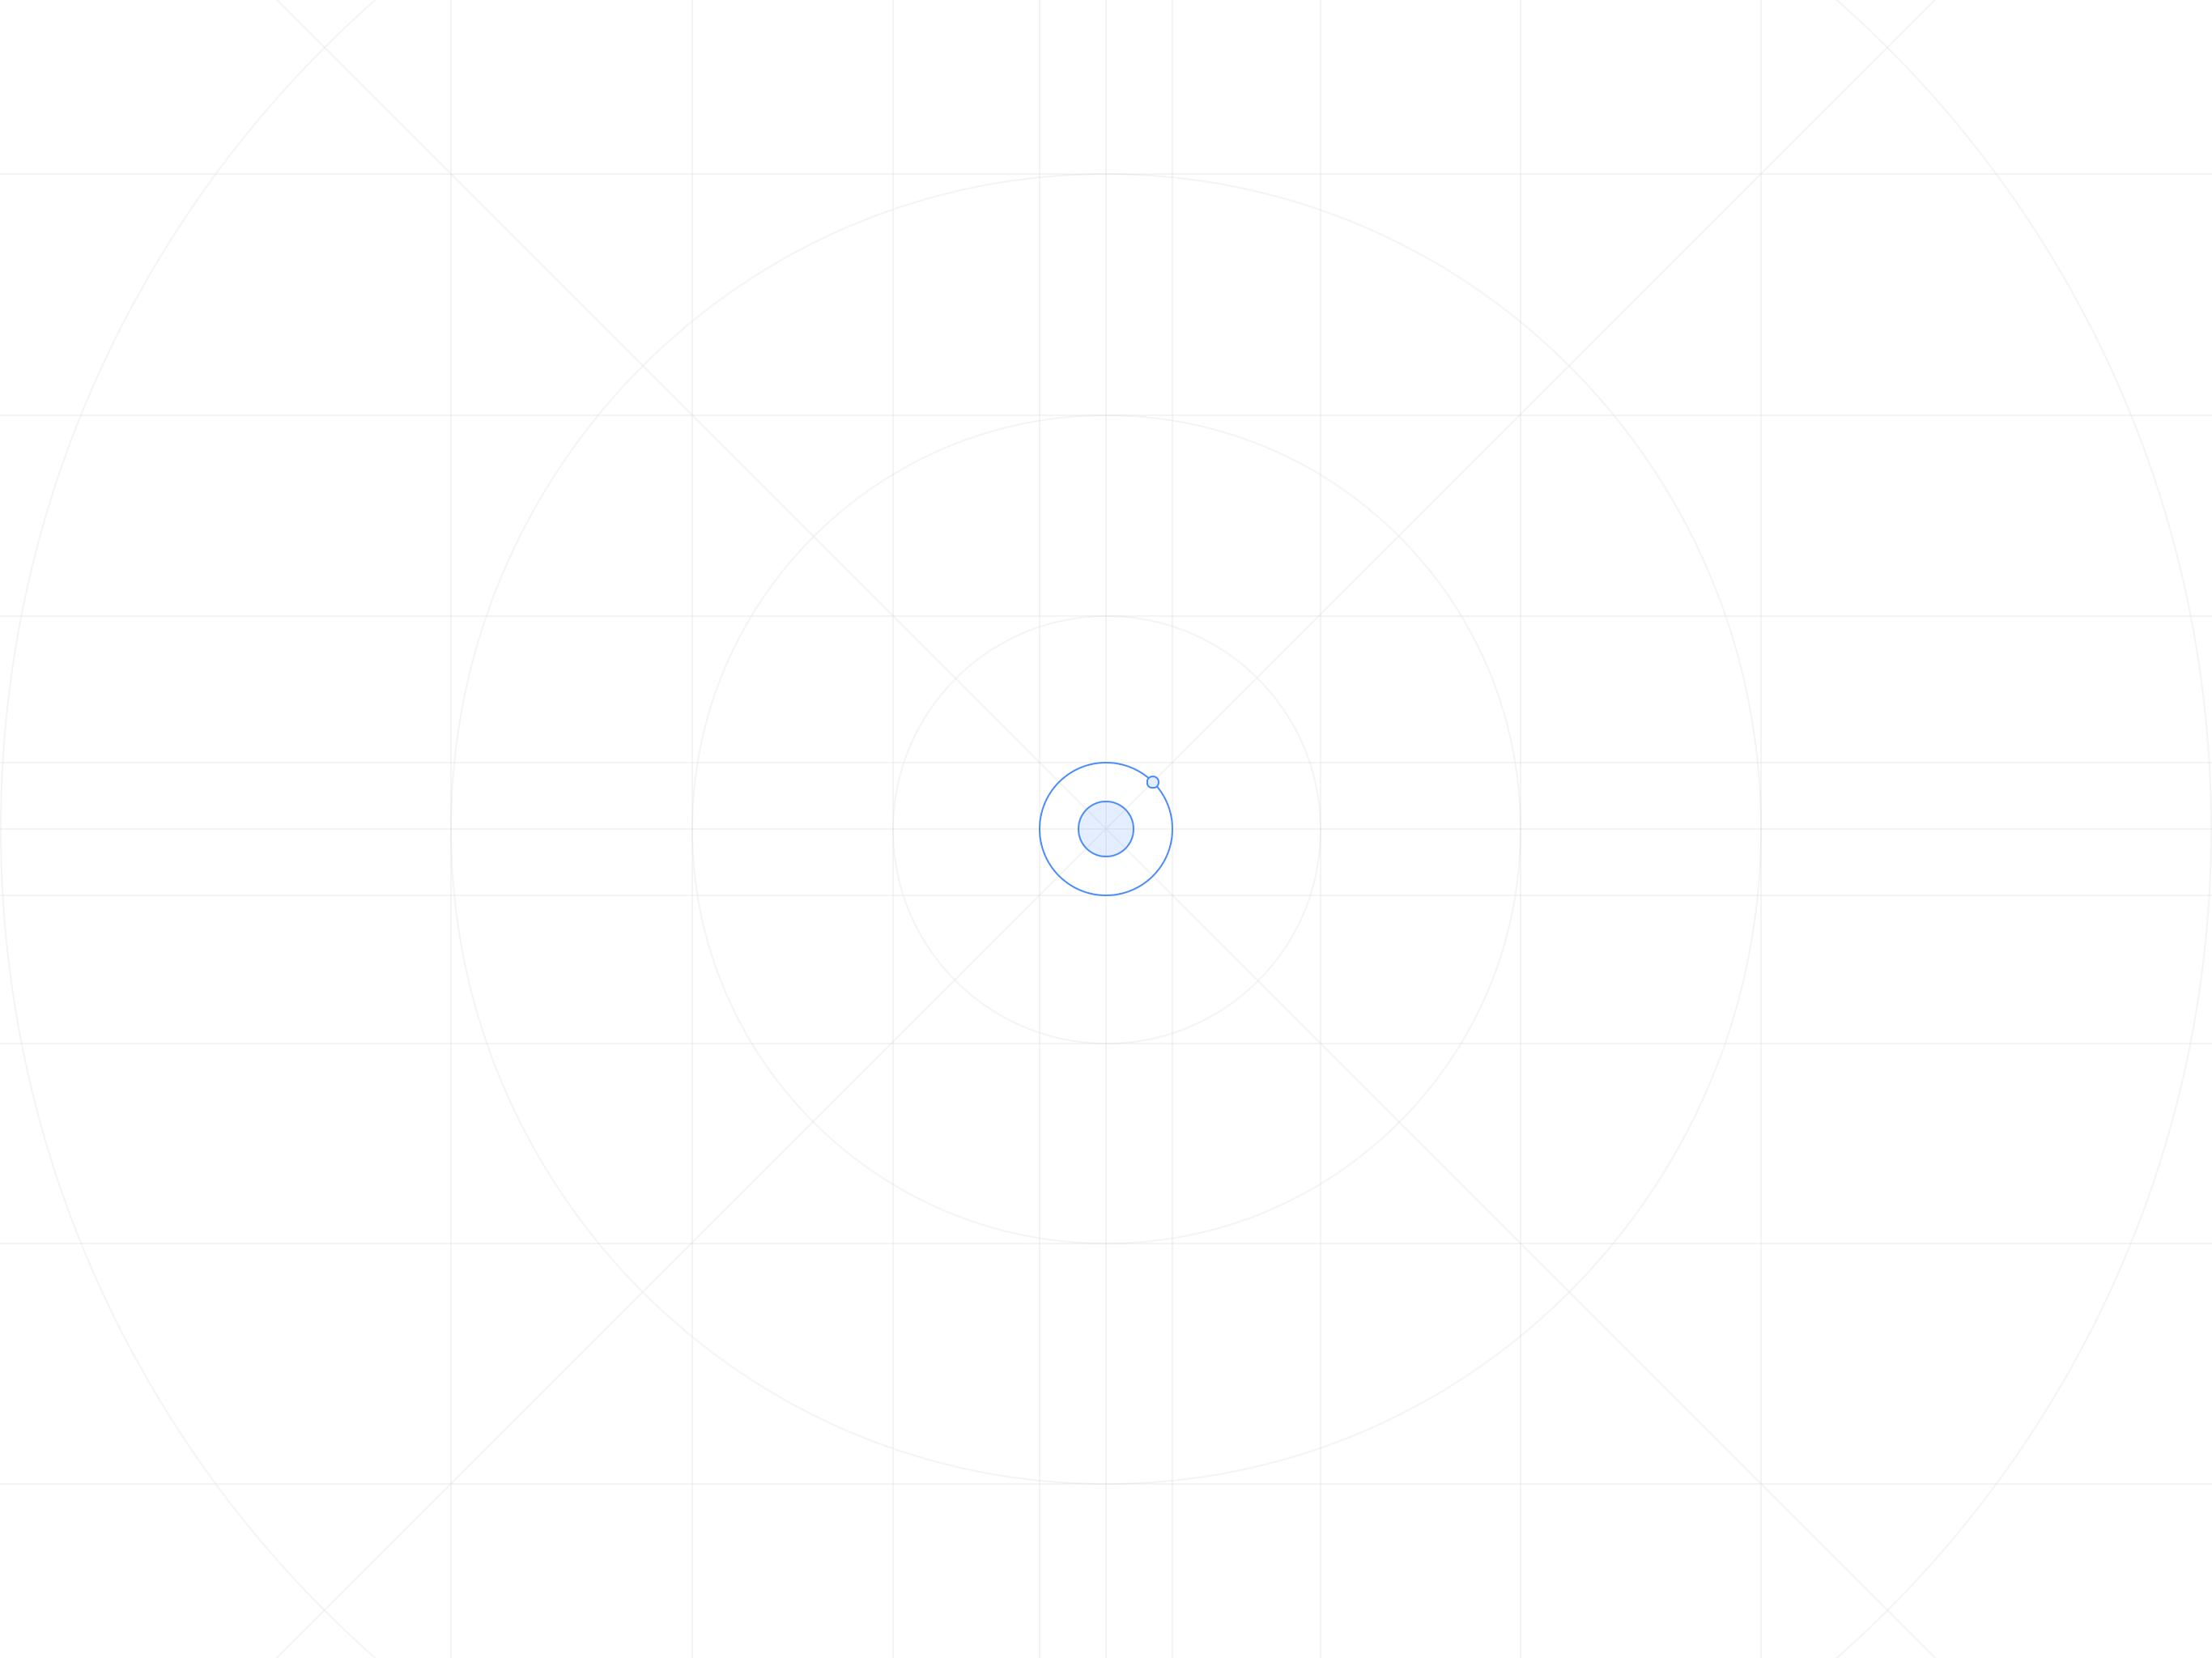 klu5/resources/ios/splash/Default-Landscape@~ipadpro.png